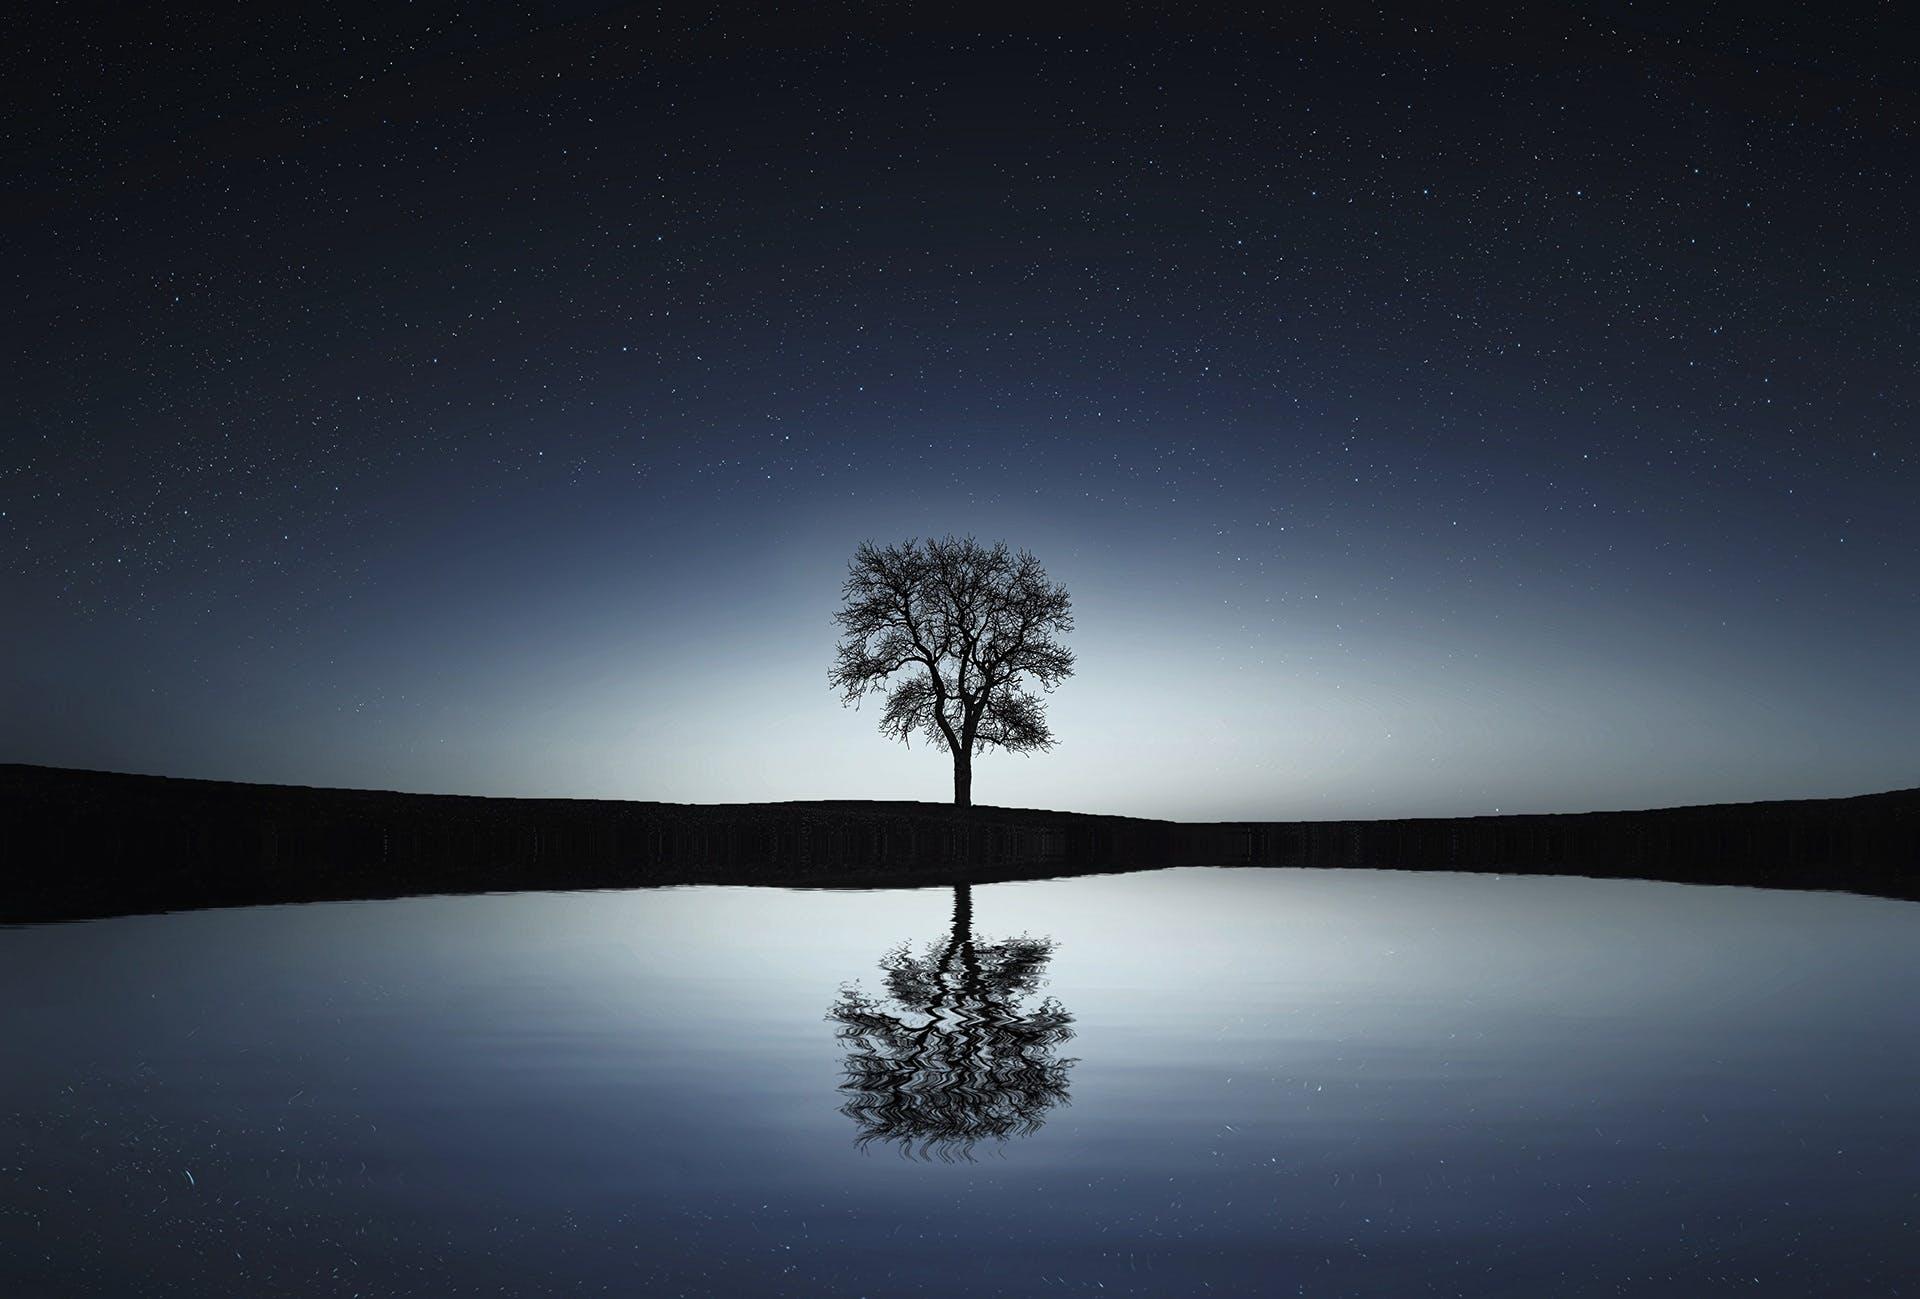 Free stock photo of landscape, nature, night, lake